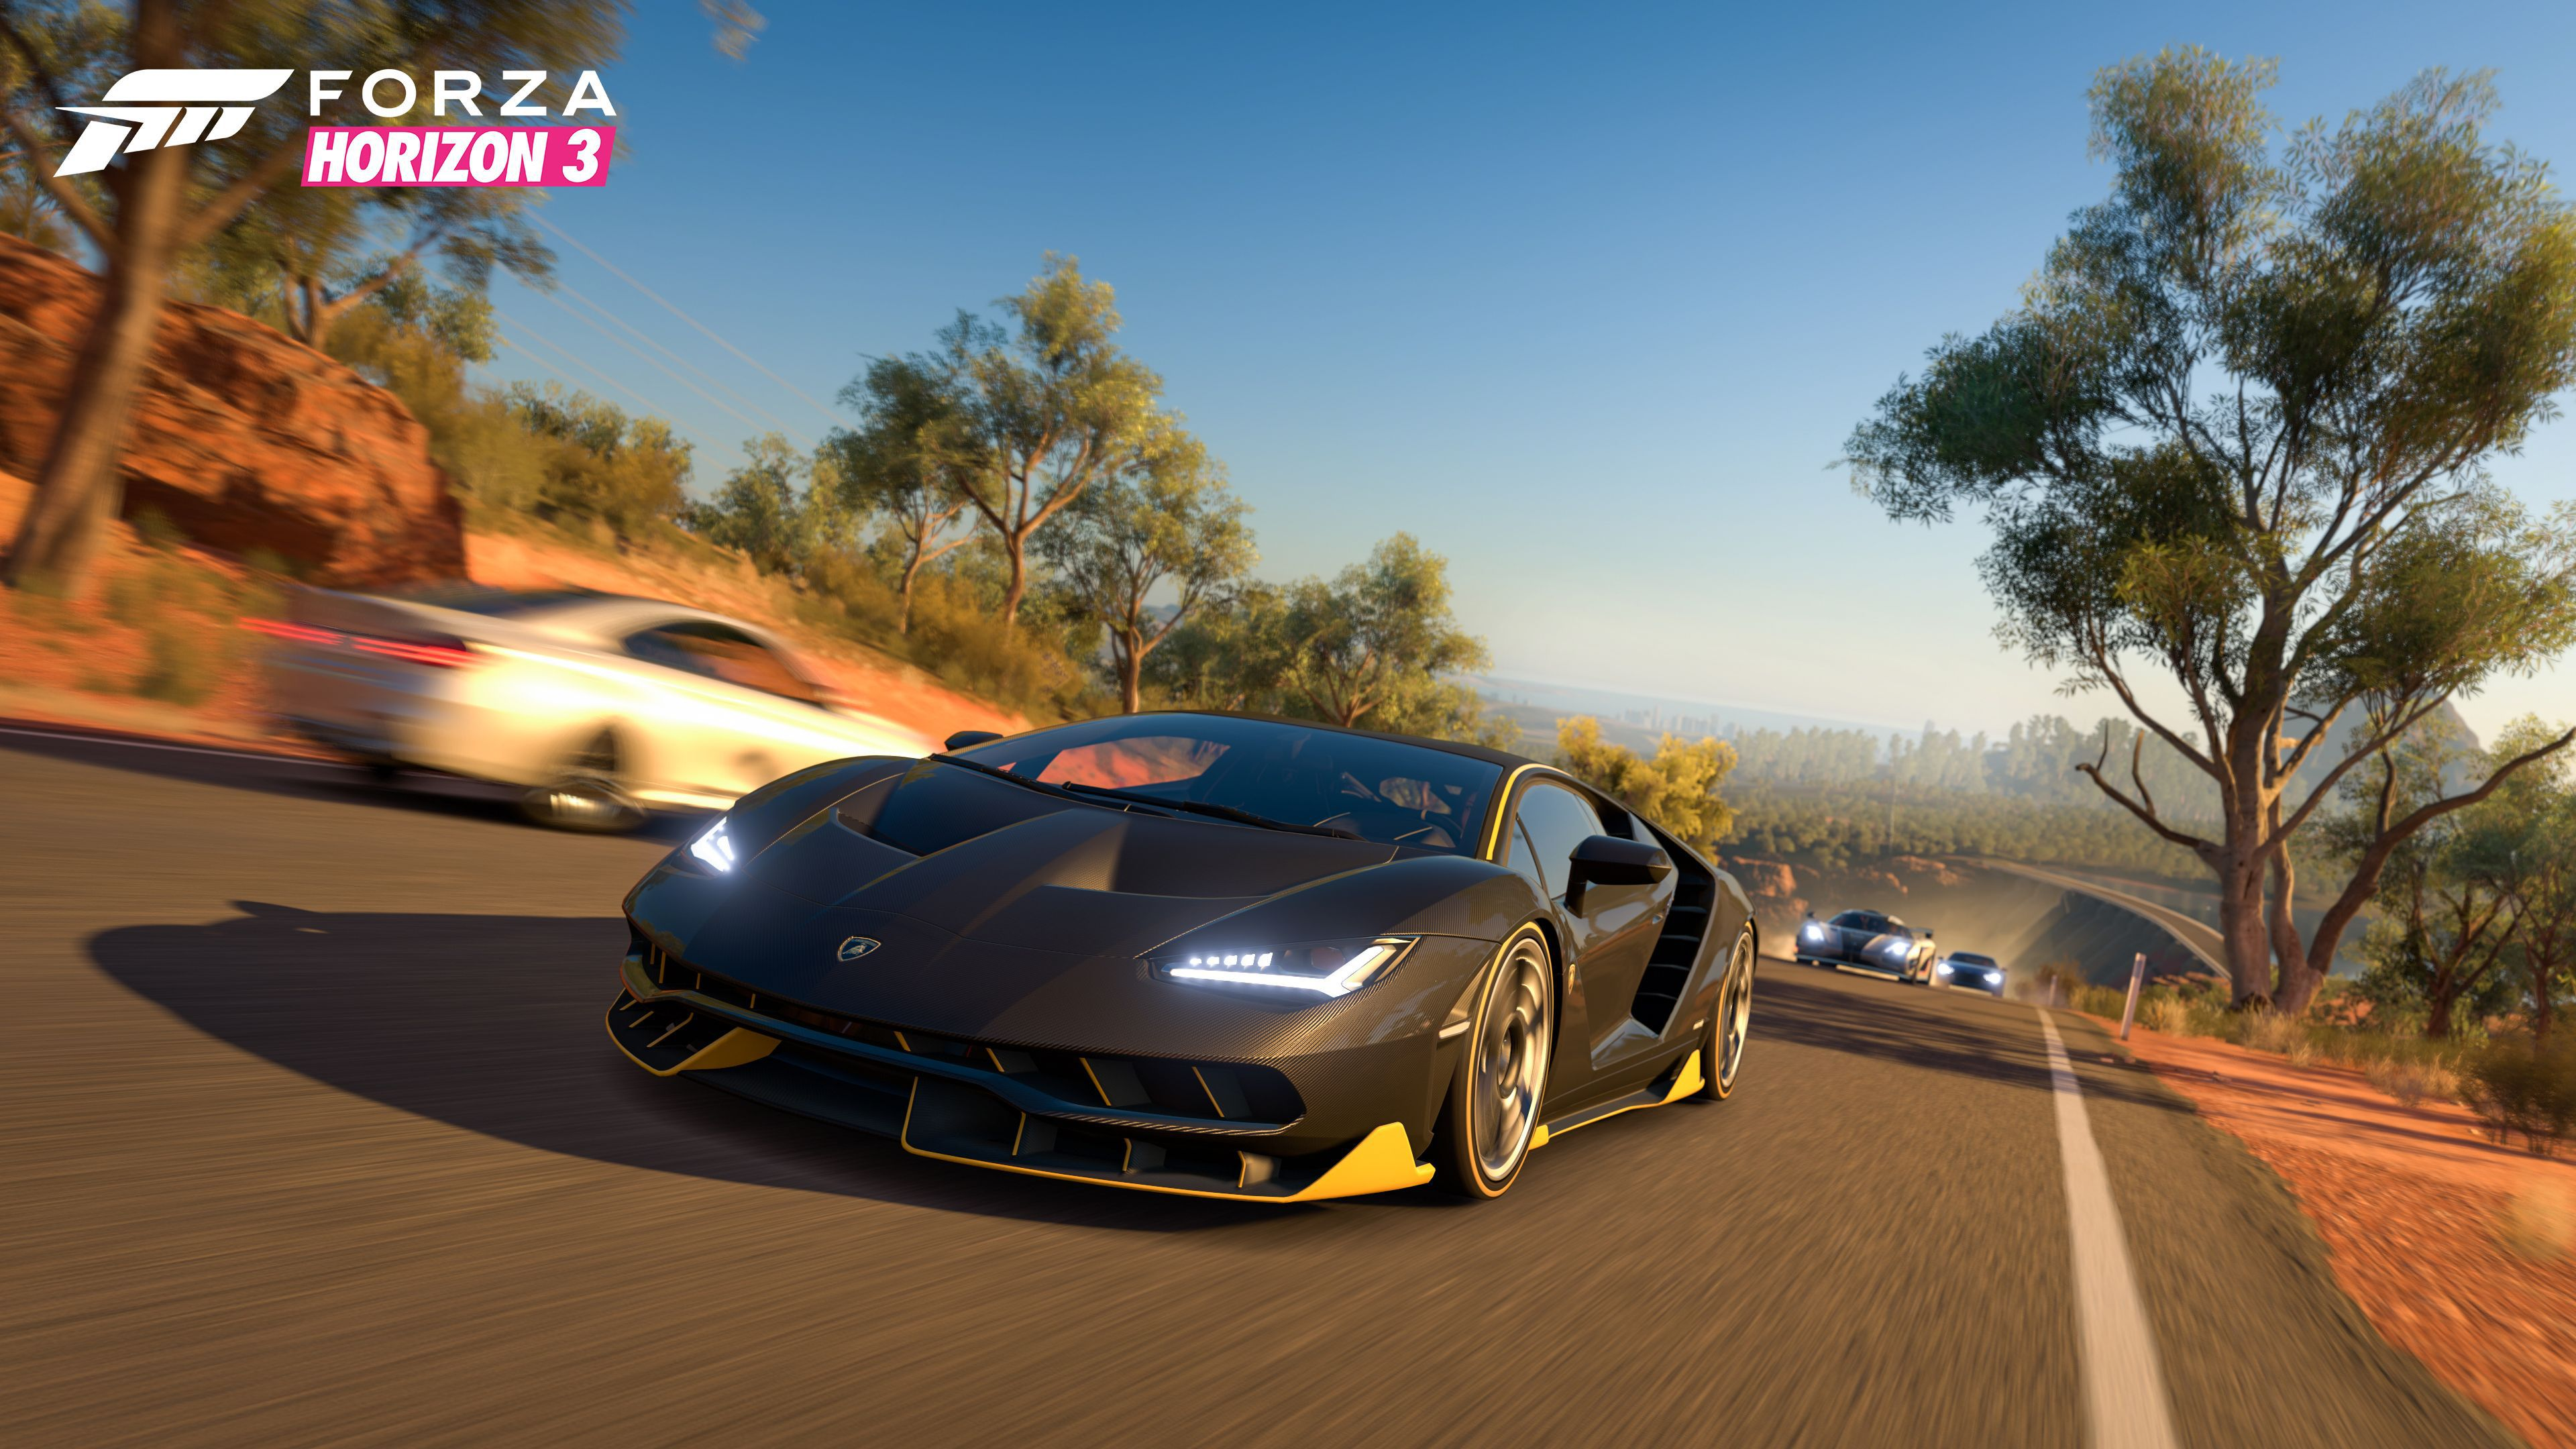 Forza Horizon 3 For Deskto